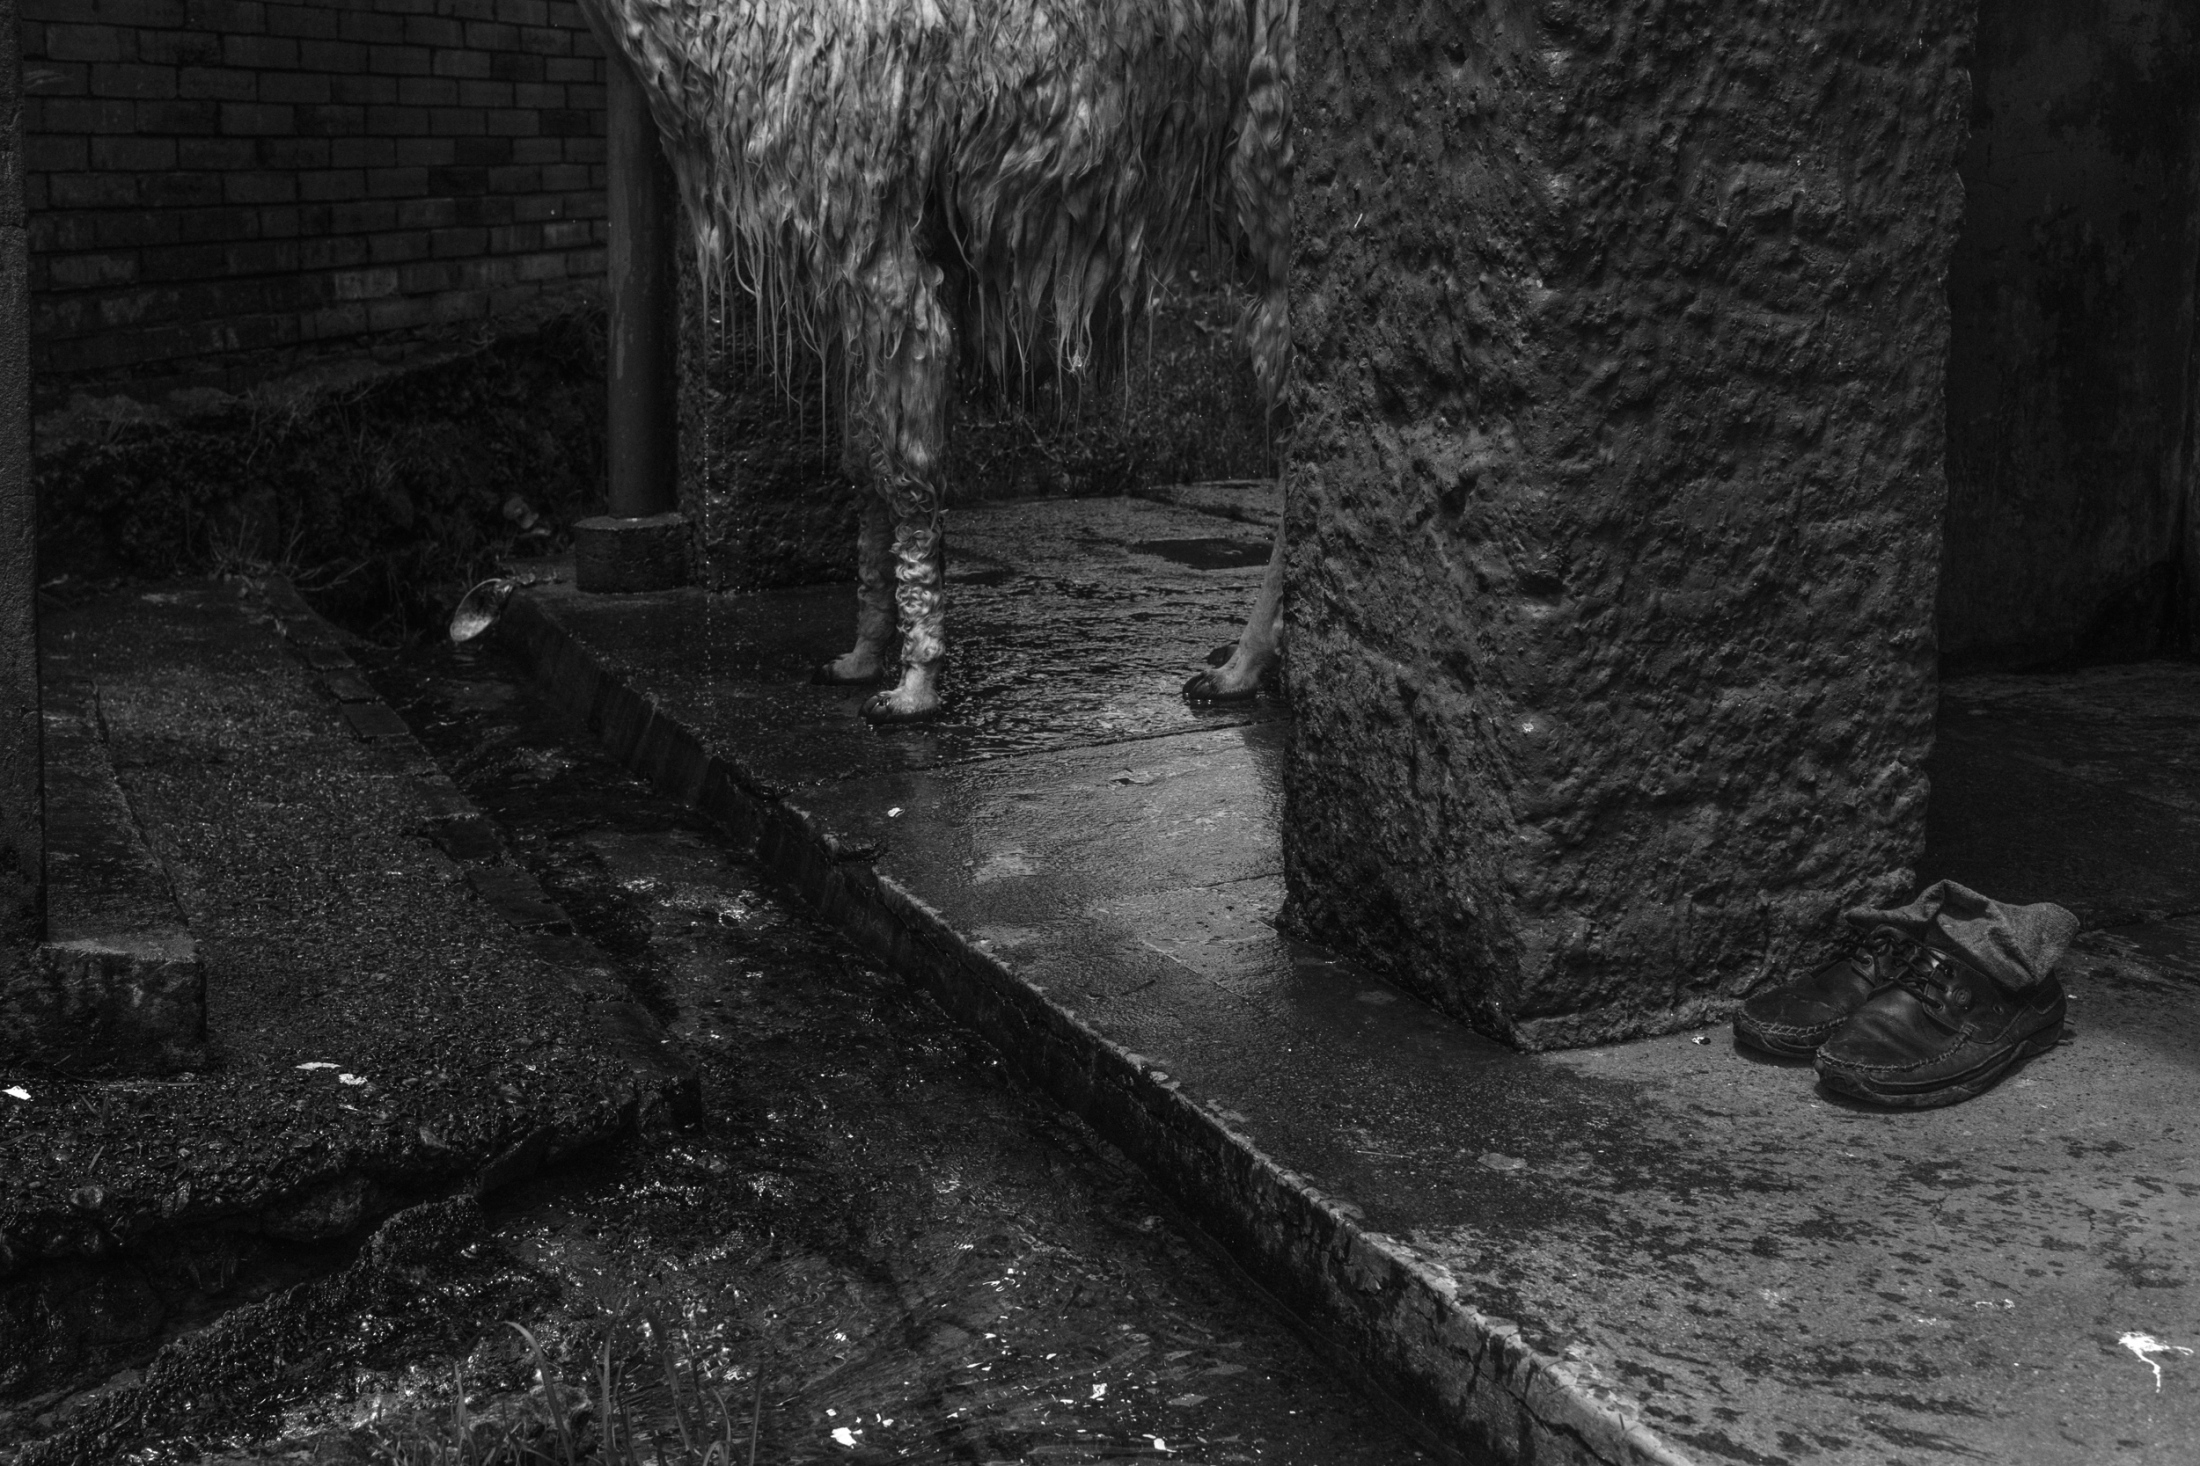 Art and Documentary Photography - Loading ZuletaR__os_CarangasYElJaguar_007.JPG